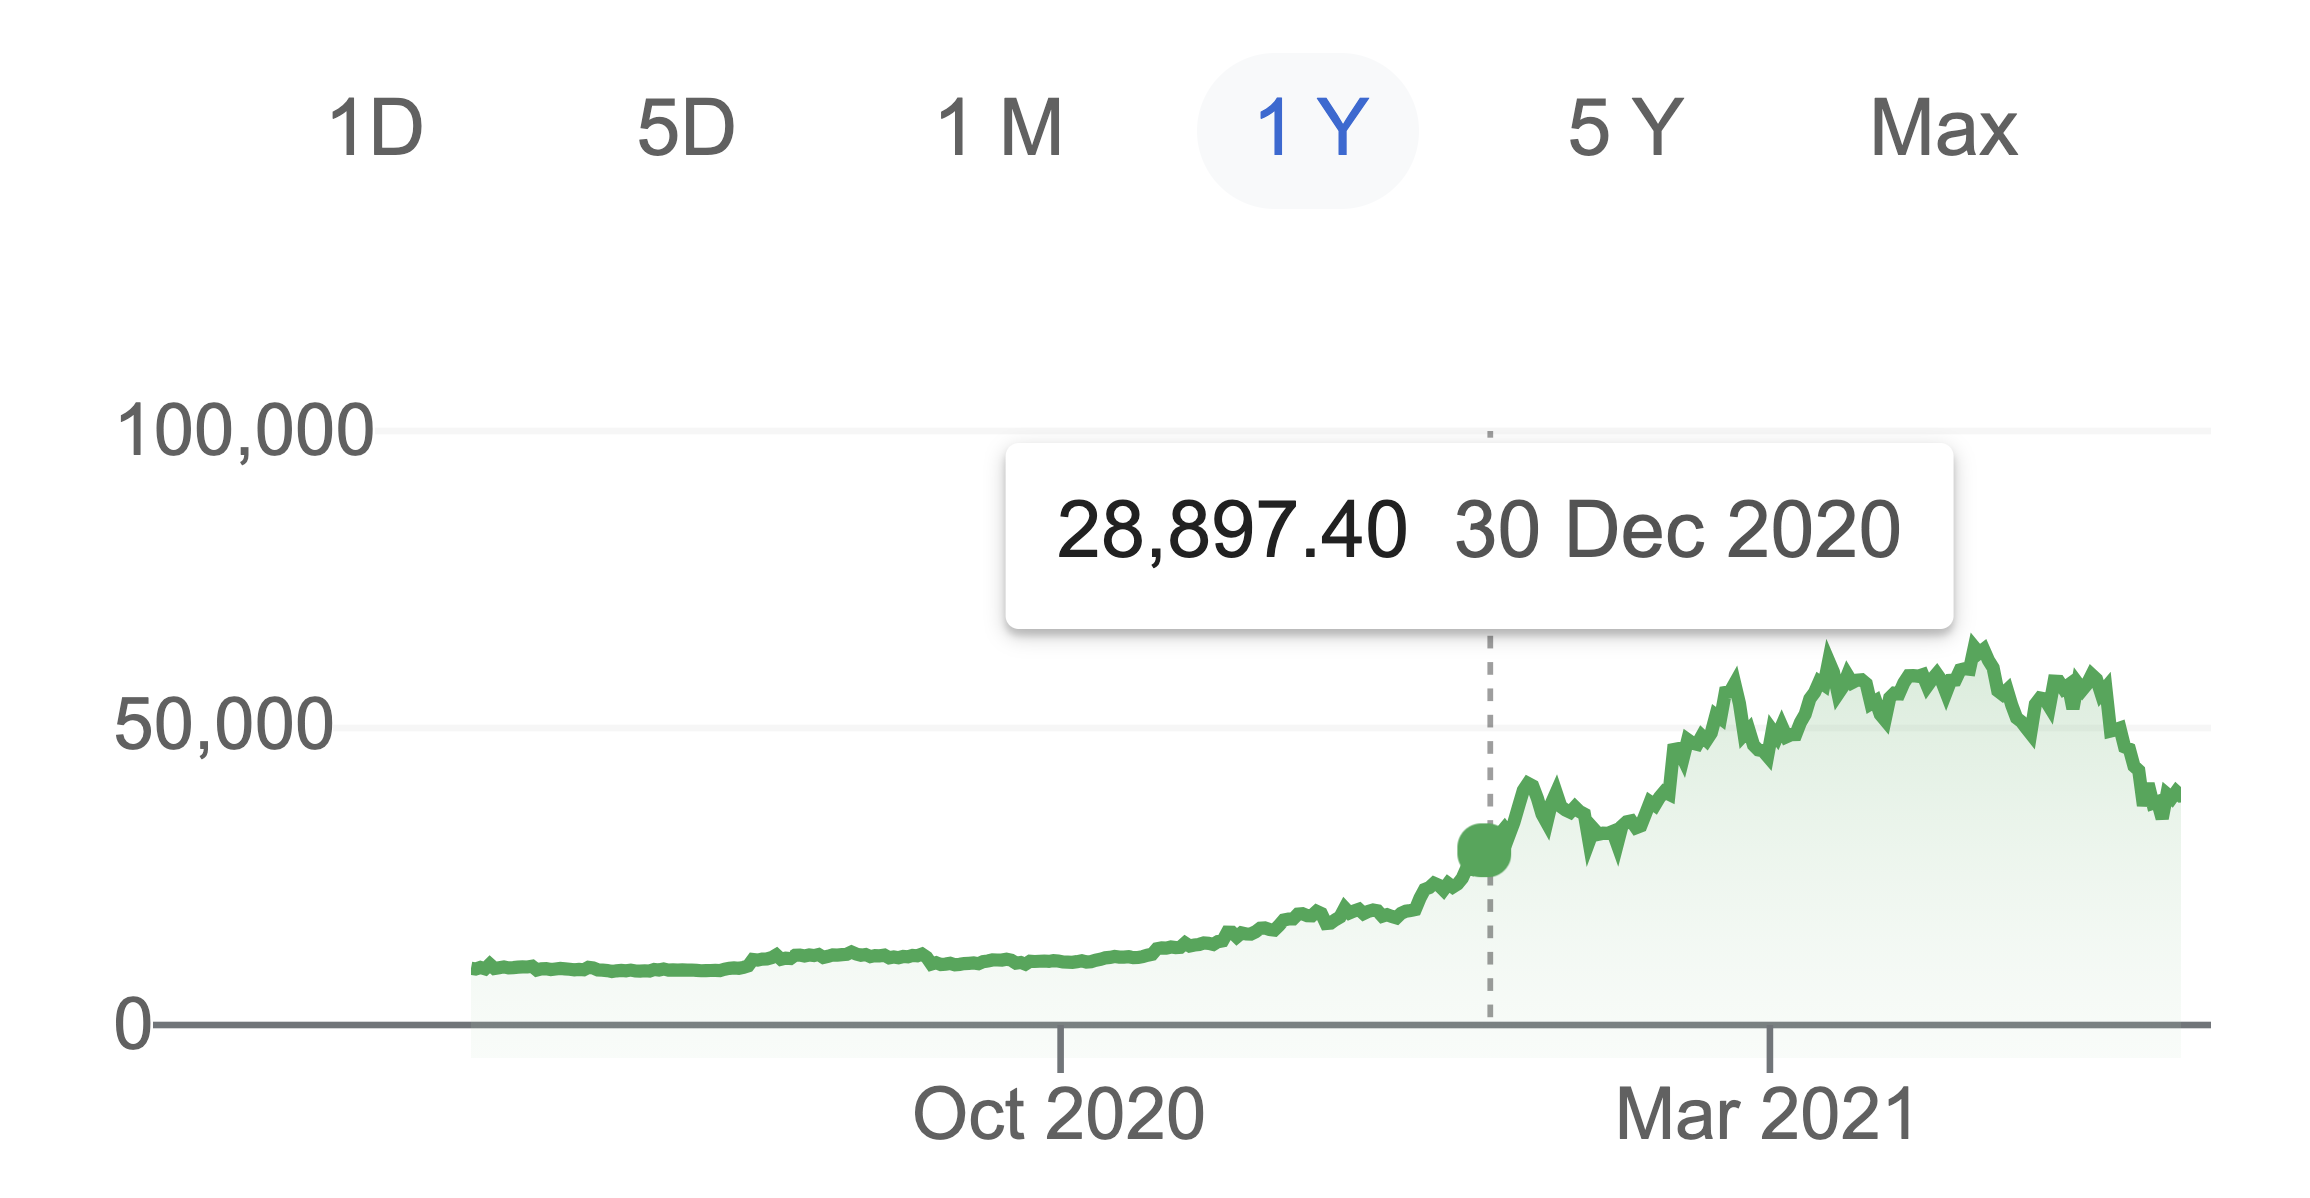 Bitcoin pricechart 2020 and 2021